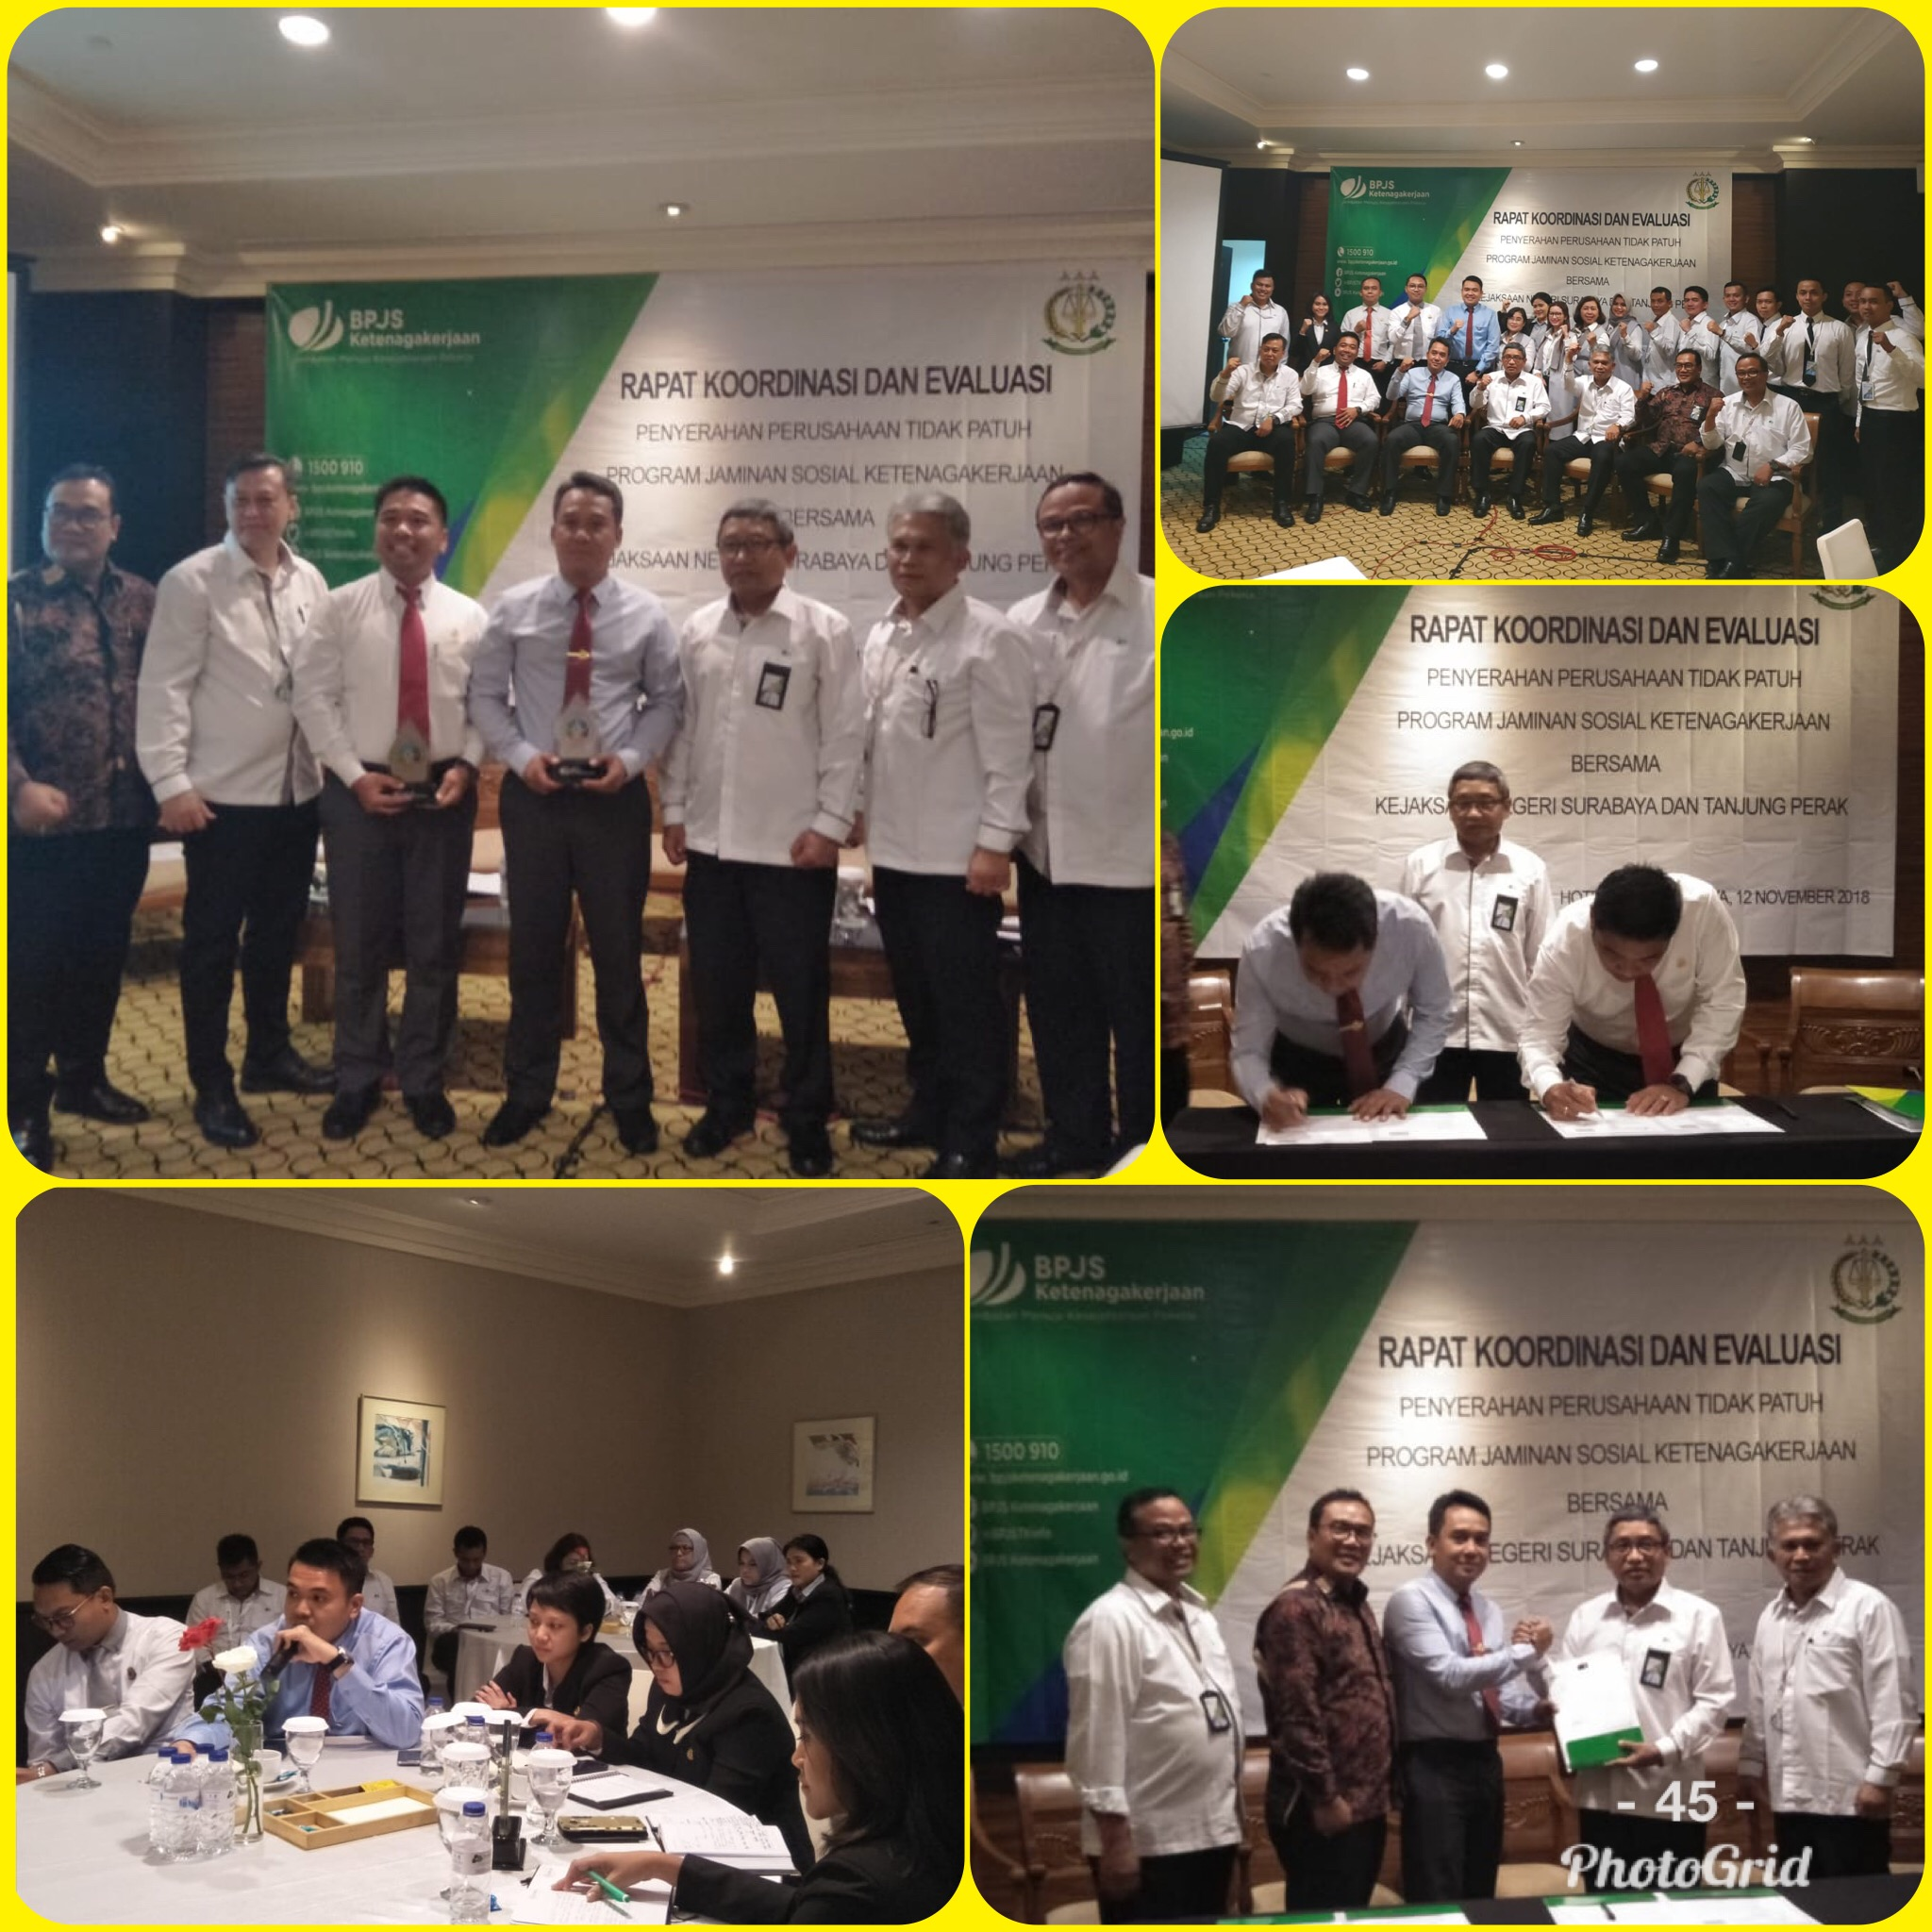 Rapat Koordinasi dan Evaluasi BPJS ketenagakerjaan Surabaya Raya 12-11-2018